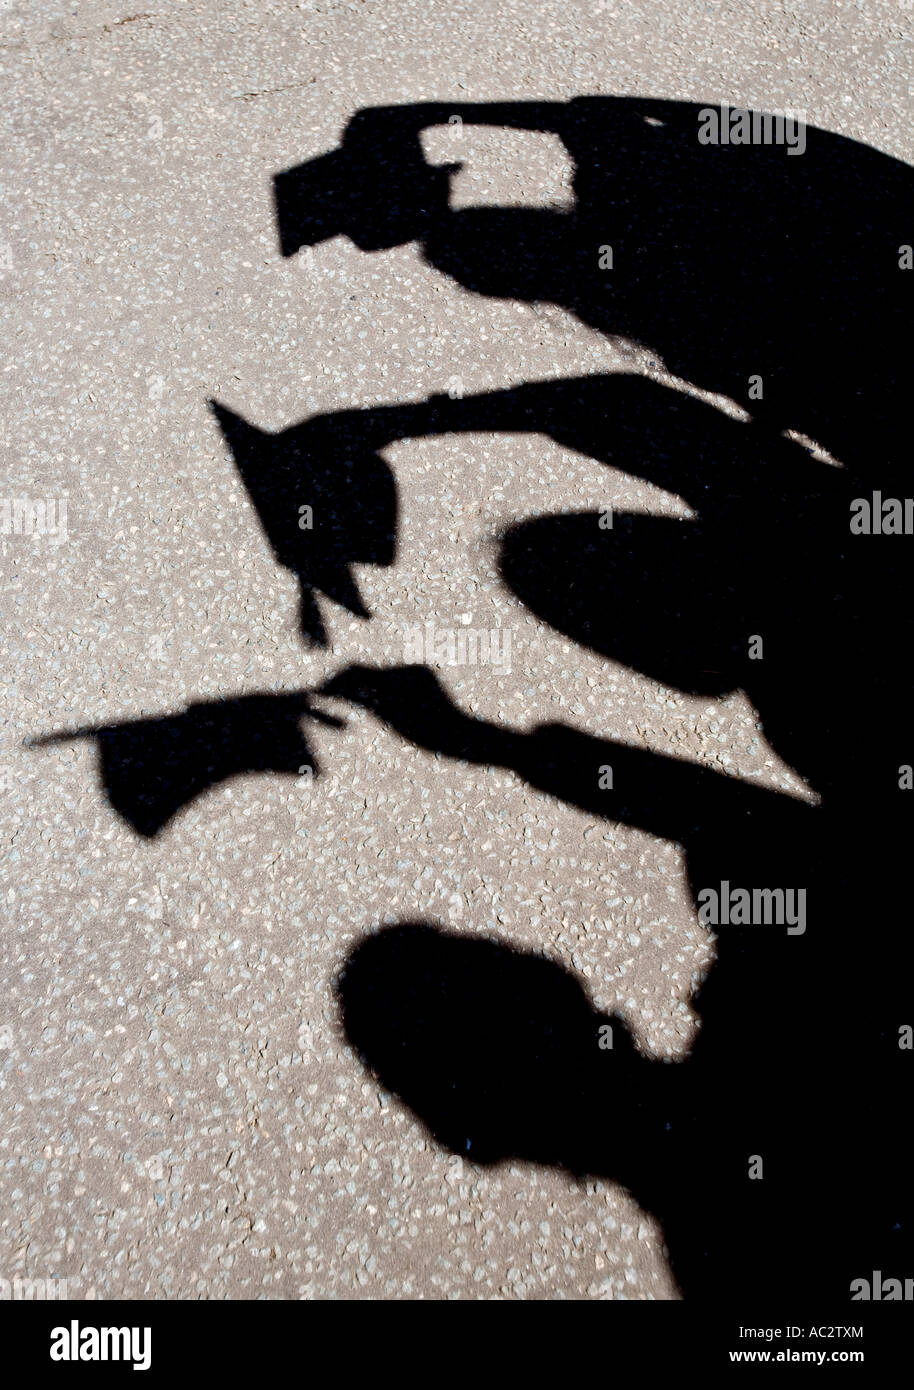 University Degree Stockfotos & University Degree Bilder - Alamy